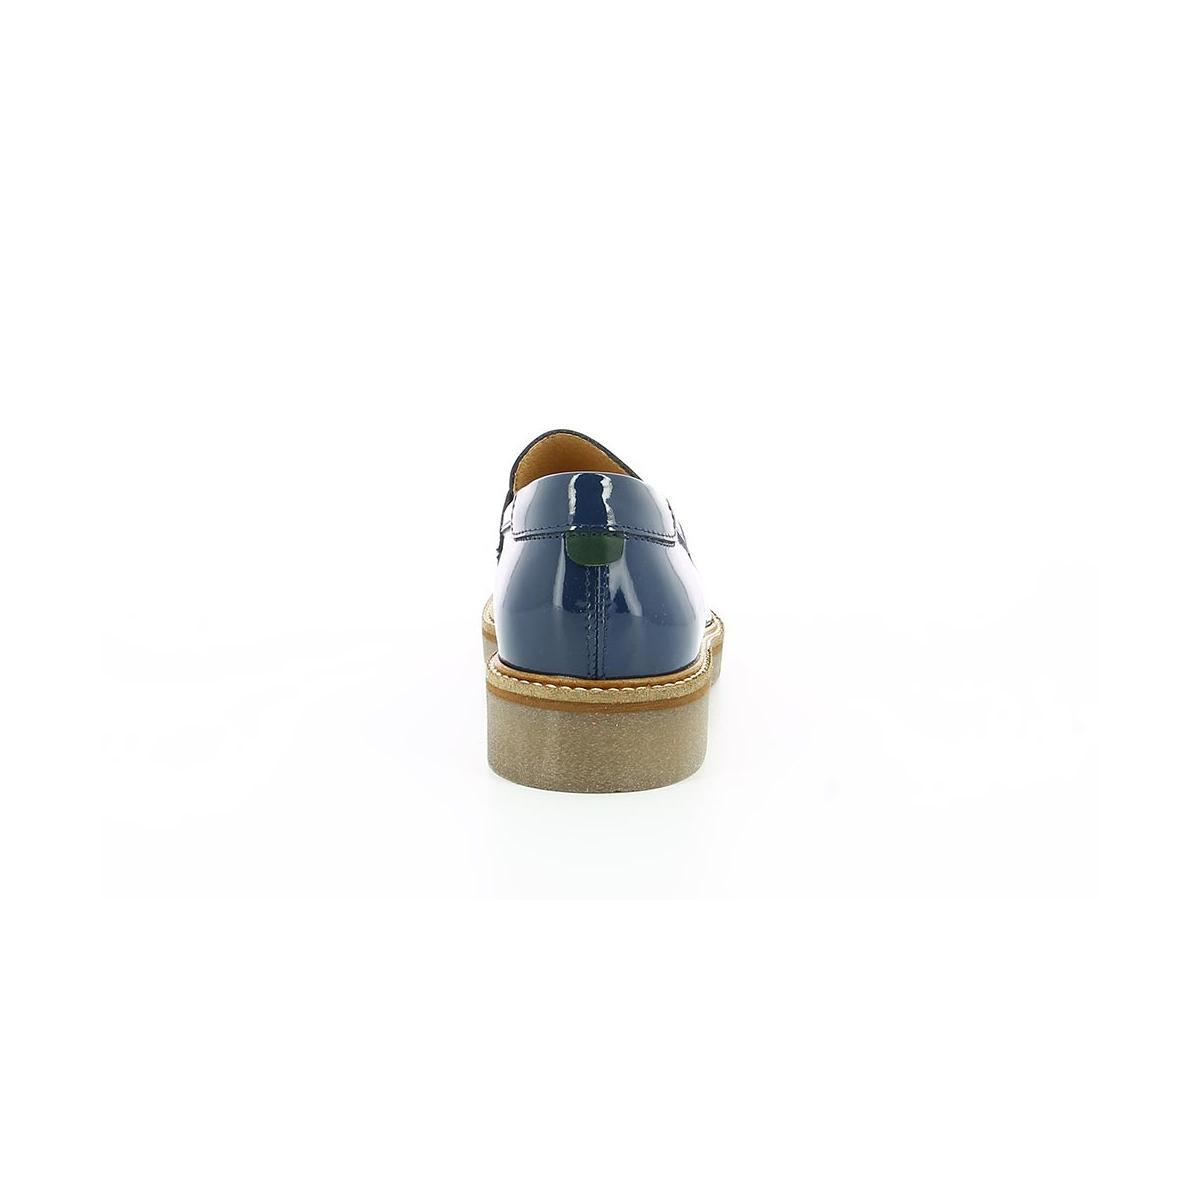 1835b6778f98e0 Chaussures Femme OXMOX MARINE VERNIS - Kickers